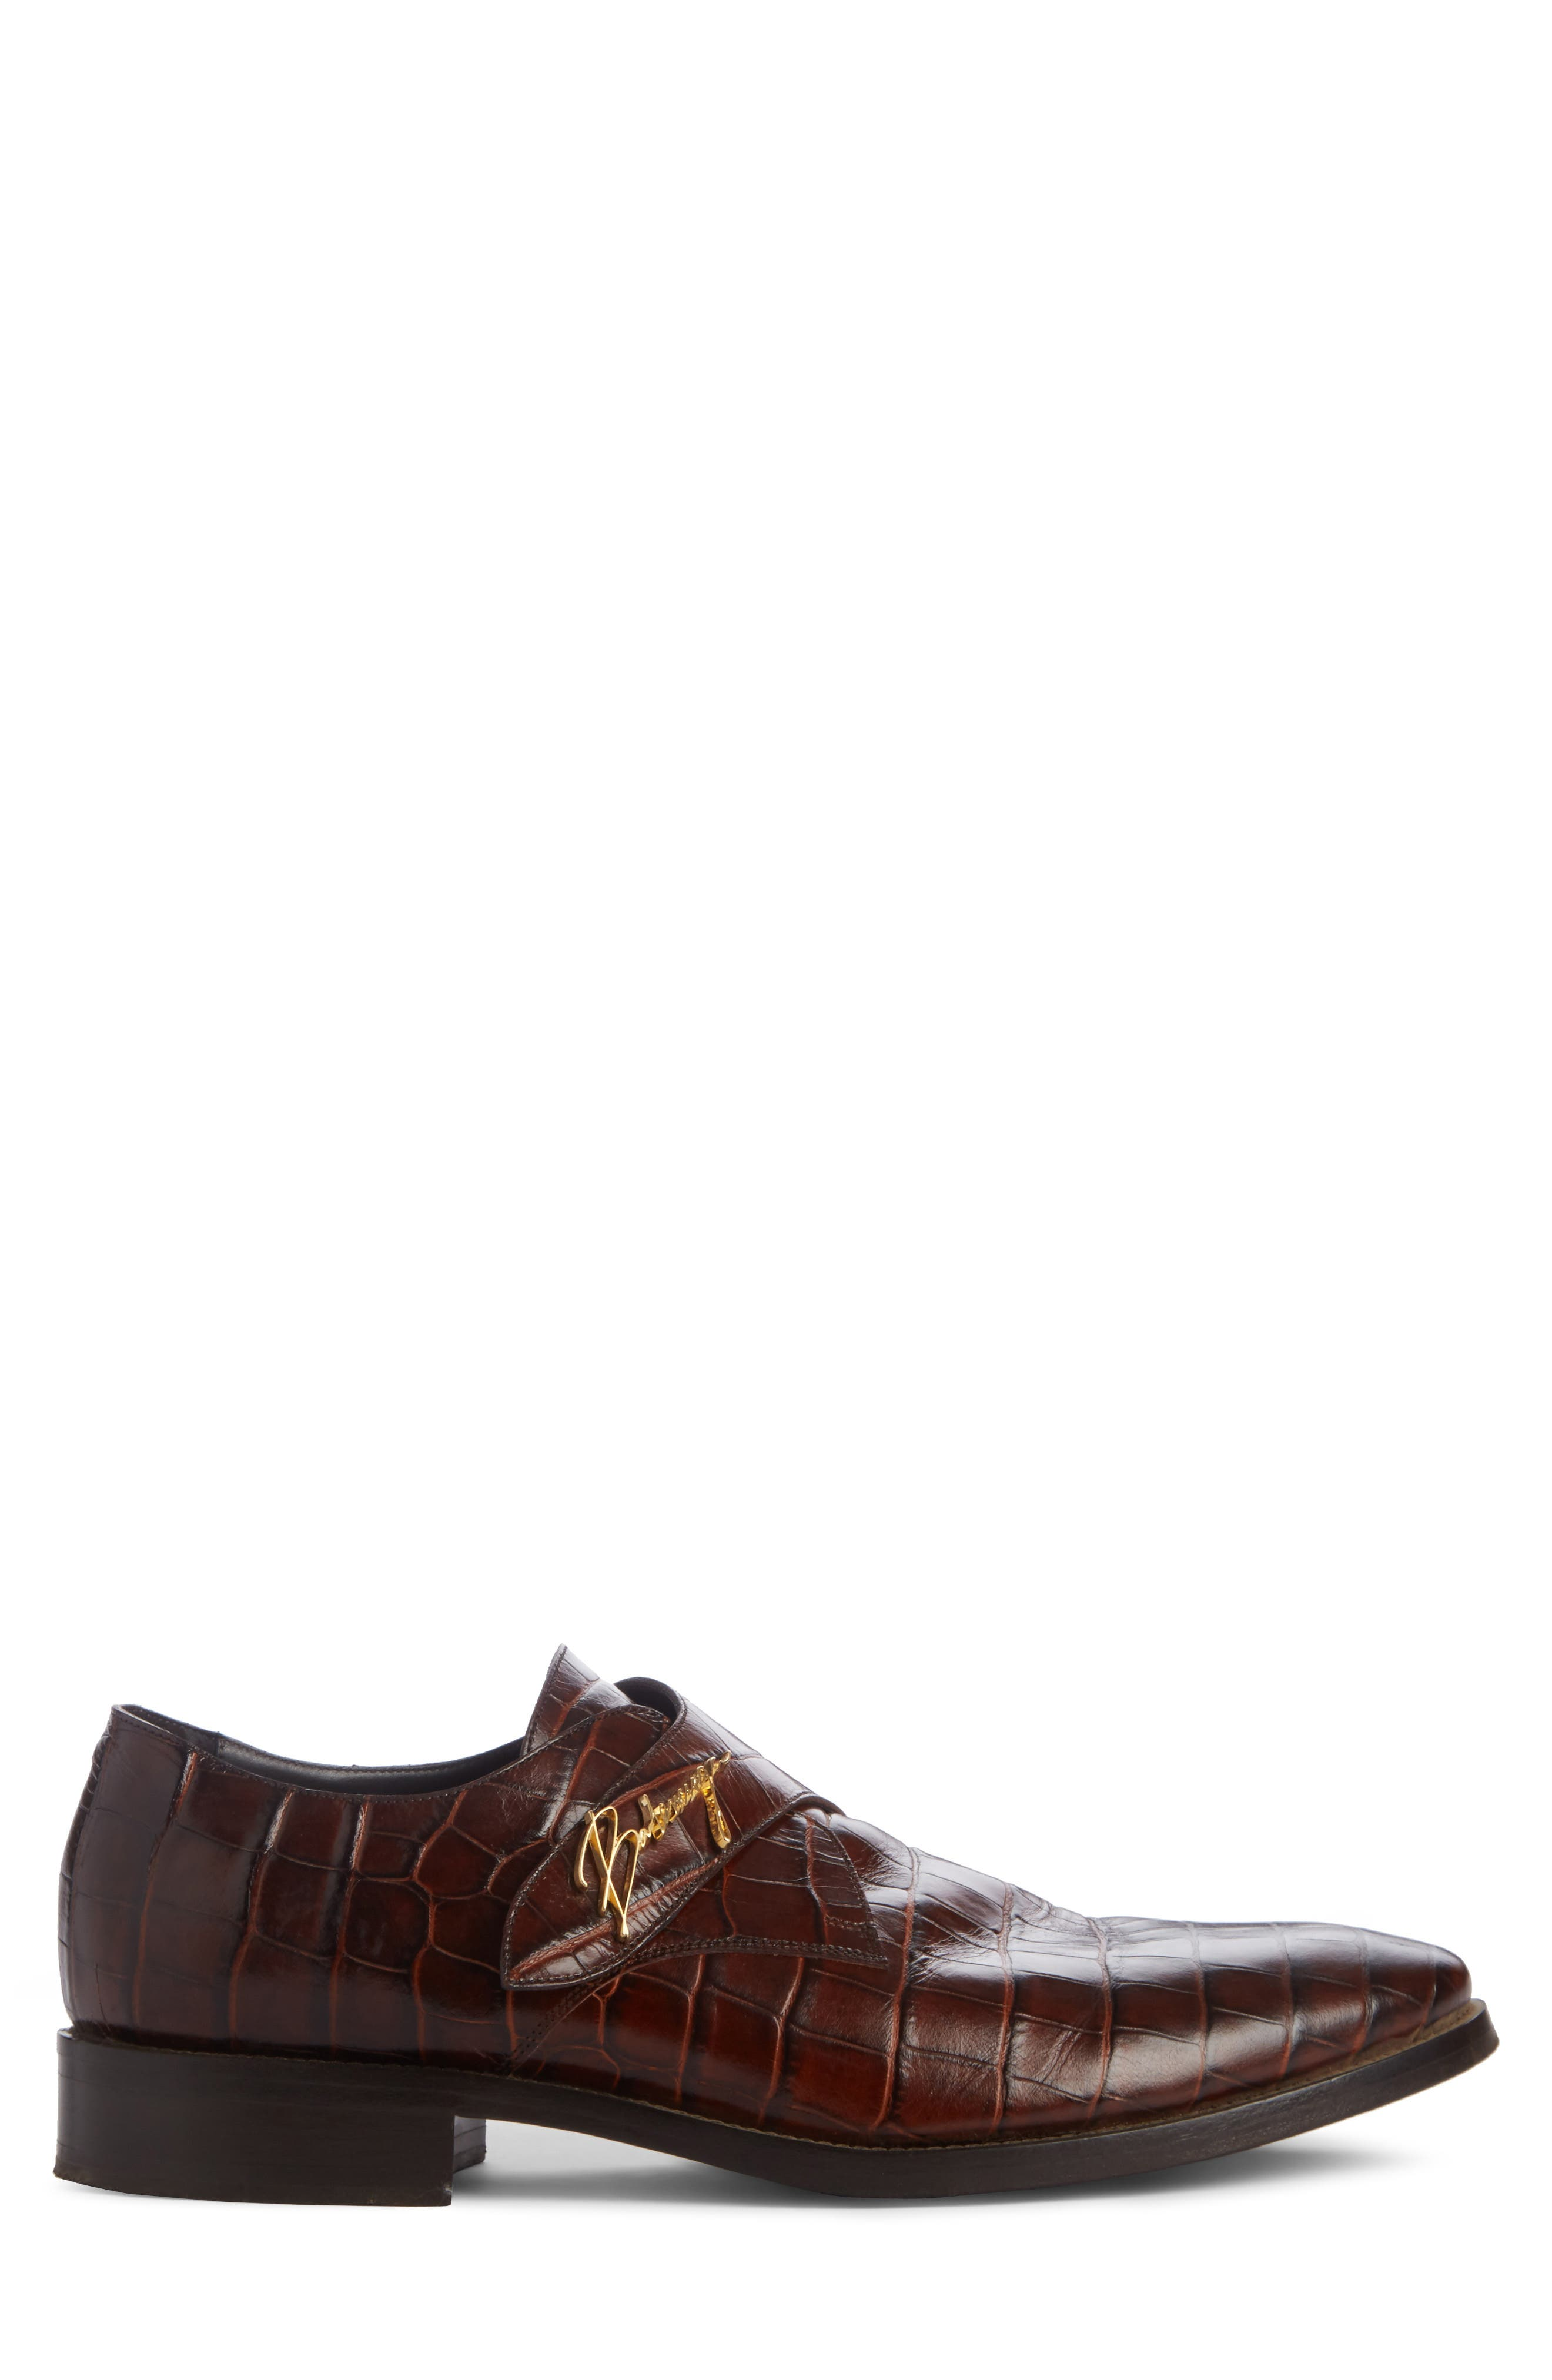 Monk Strap Shoe,                             Alternate thumbnail 3, color,                             MARRON CHOCOLAT